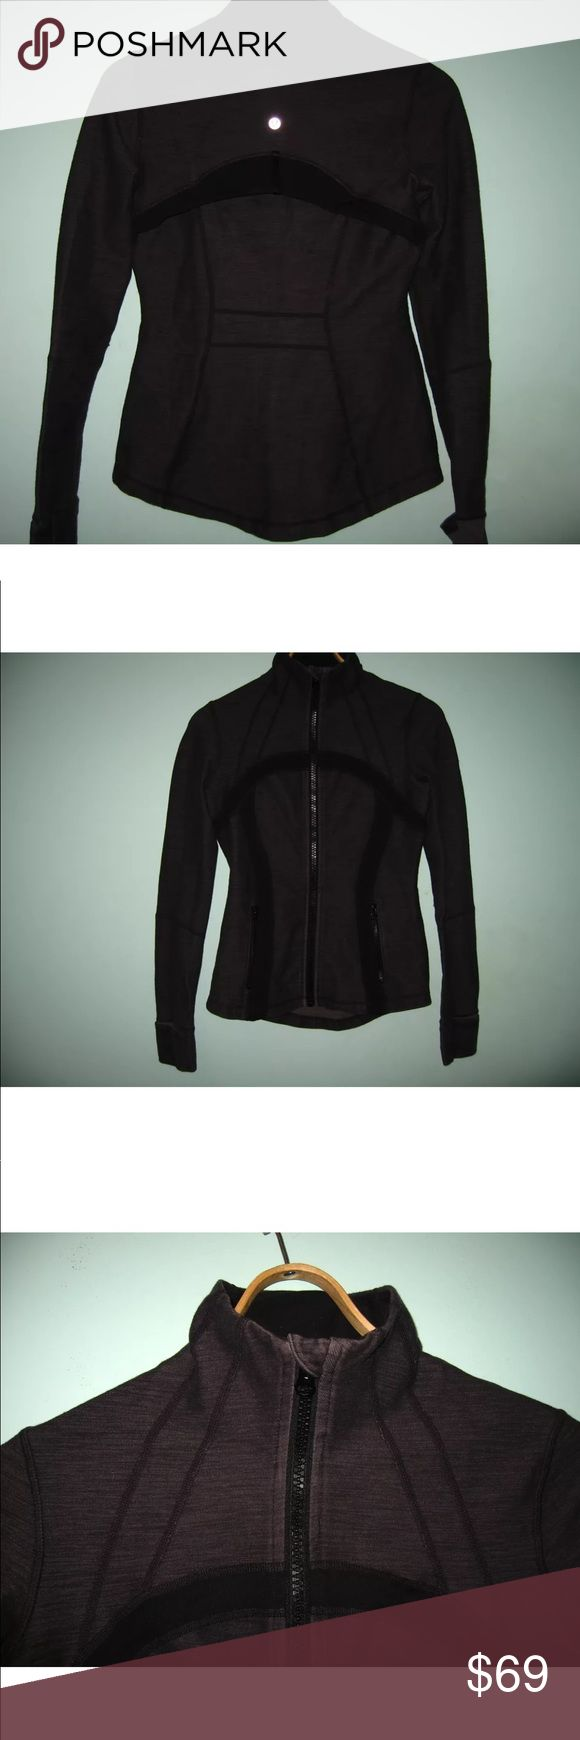 Lululemon define jacket Size 6 grey Lululemon with black Lululemon sign on the jacket. Color is faded grey, good used condition, before purchasing please ask away! lululemon athletica Tops Sweatshirts & Hoodies